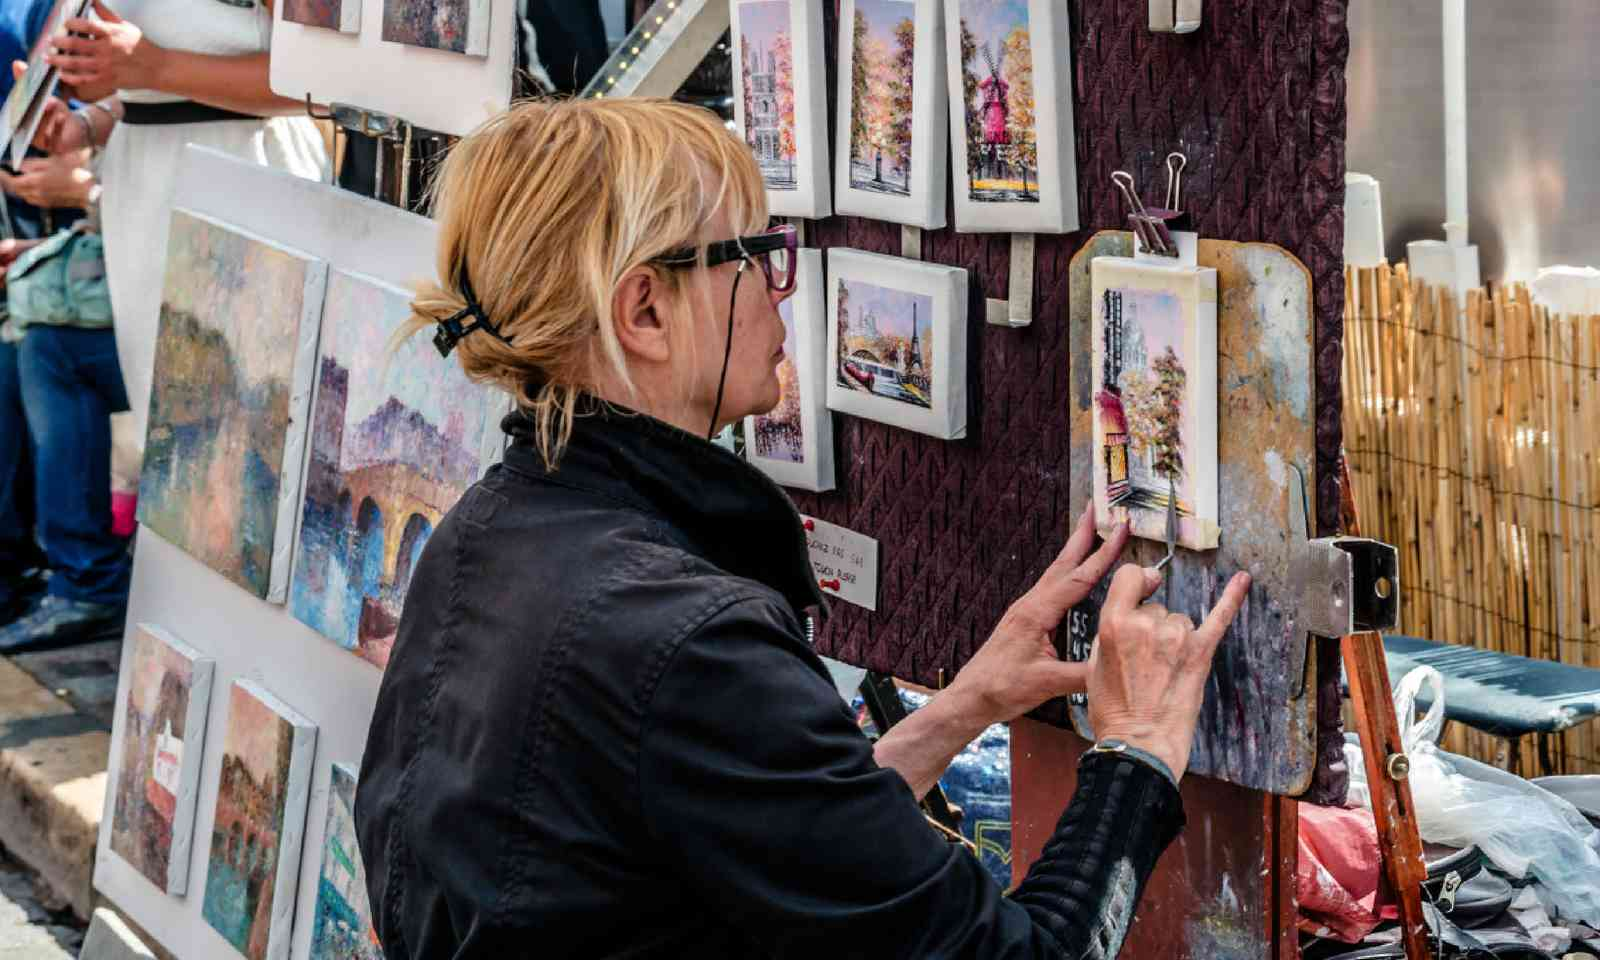 Artist in Montmartre (Shutterstock)